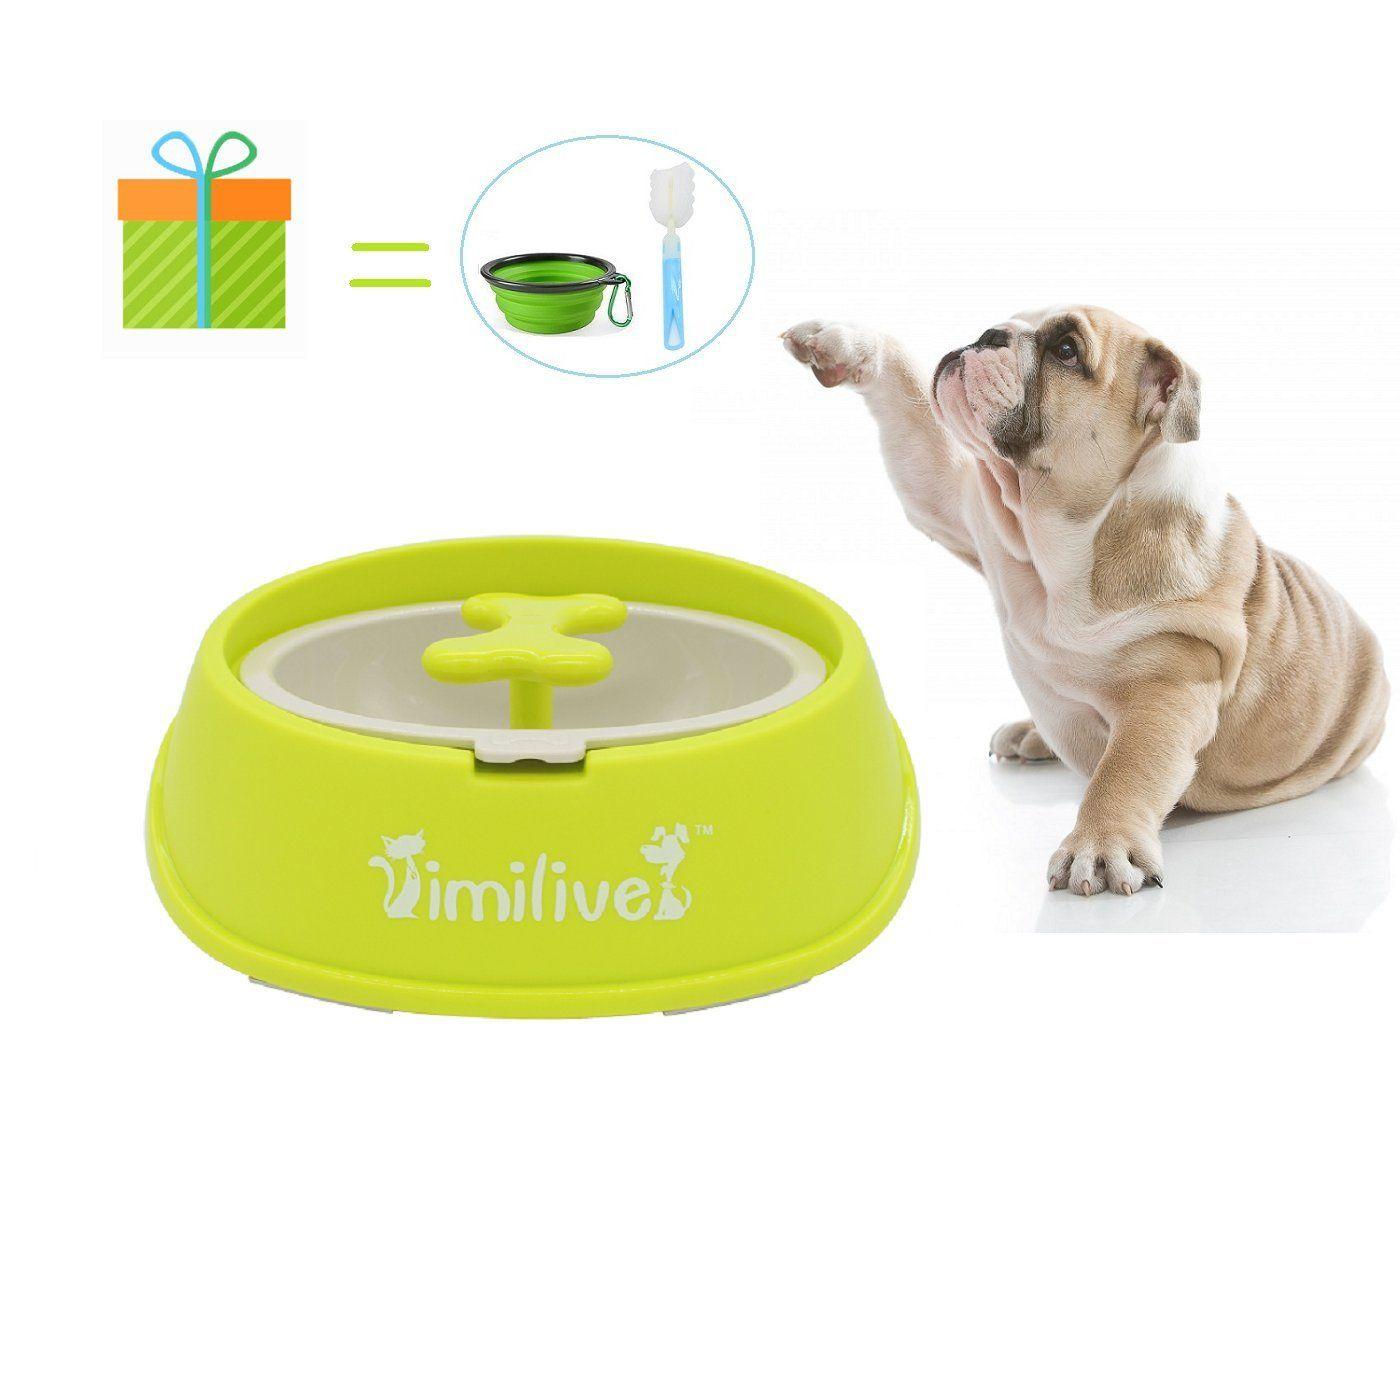 Wesen Dog Bowls 80 Oz Stainless Steel Dog Food Bowl And Pet Bowl